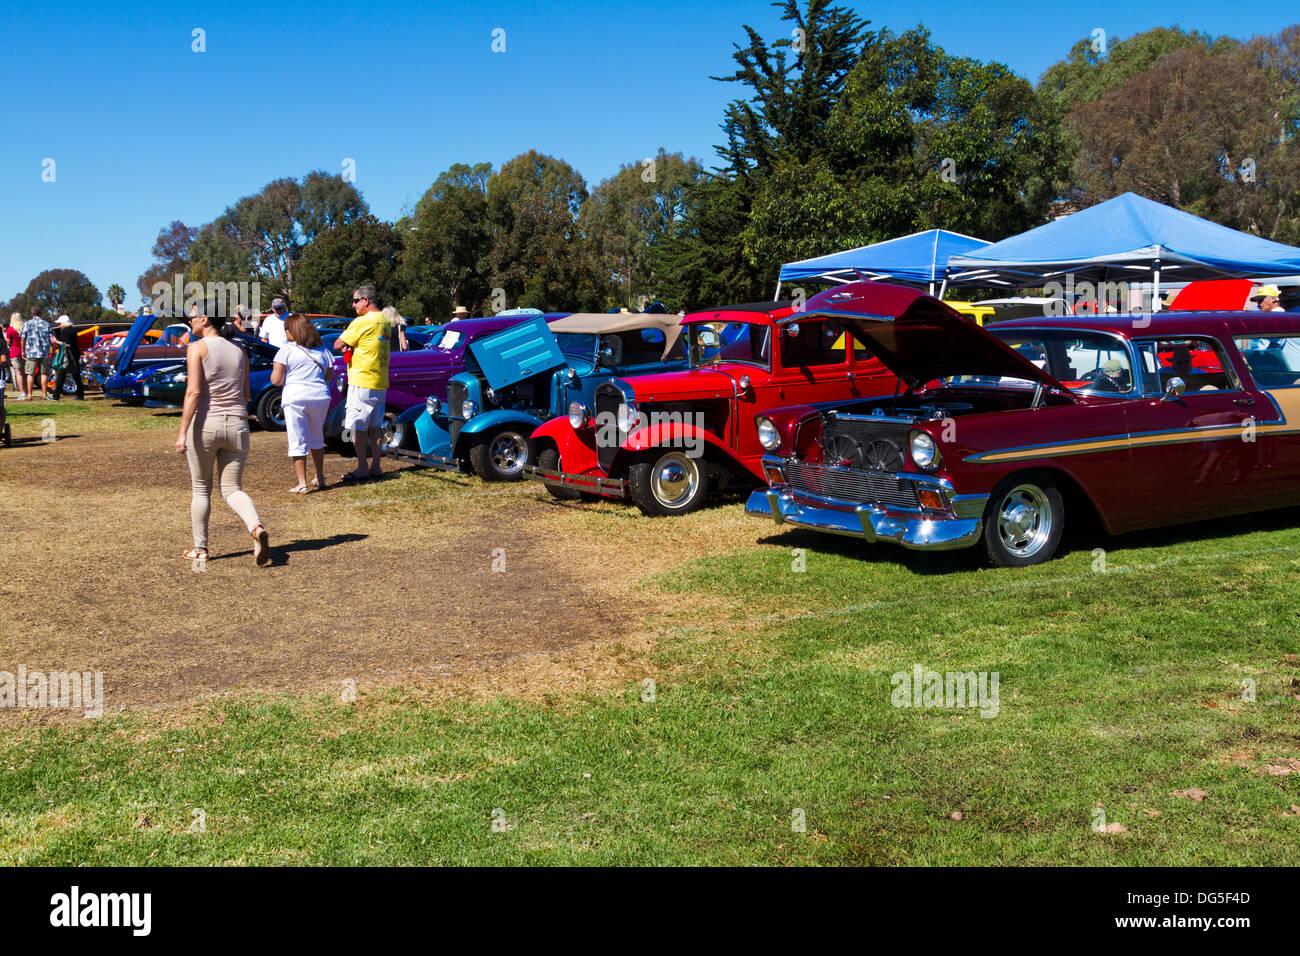 Modified Classic Car Stock Photos & Modified Classic Car Stock ...